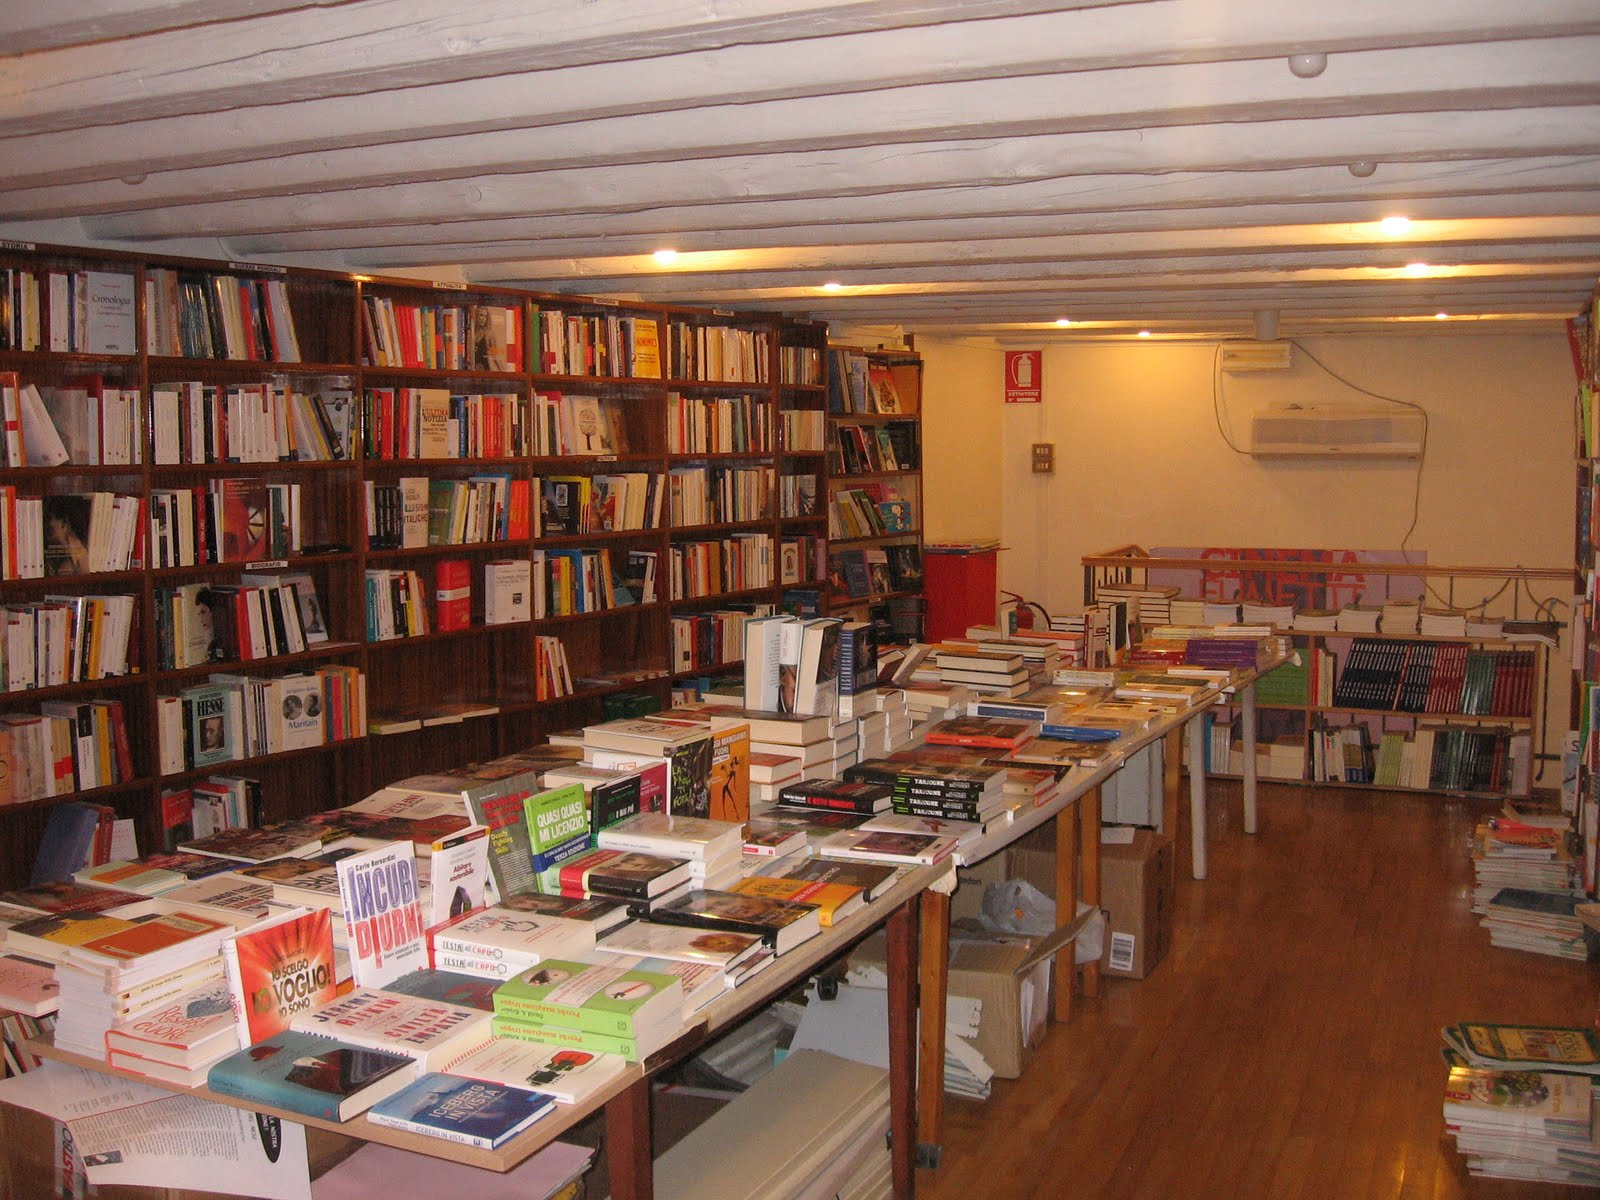 Libreria bonturi